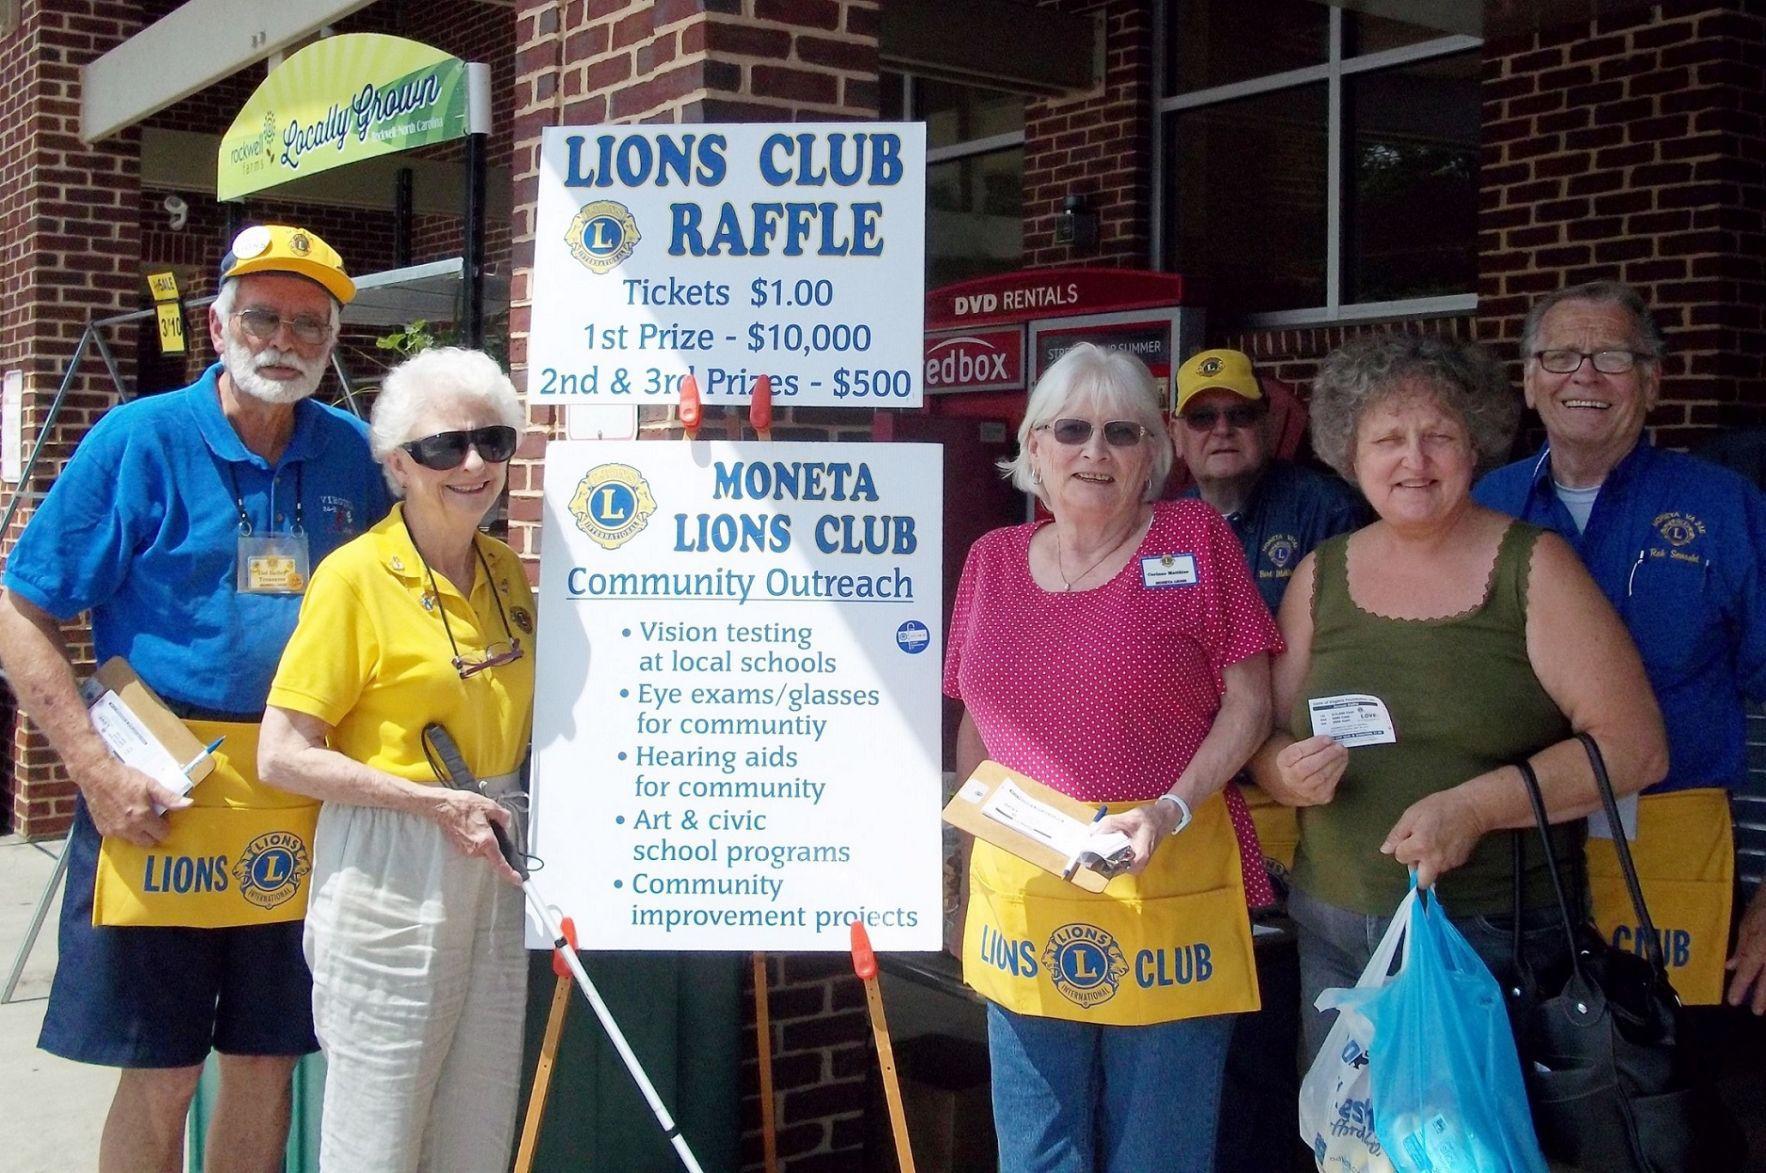 moneta lions club sell tickets for annual raffle